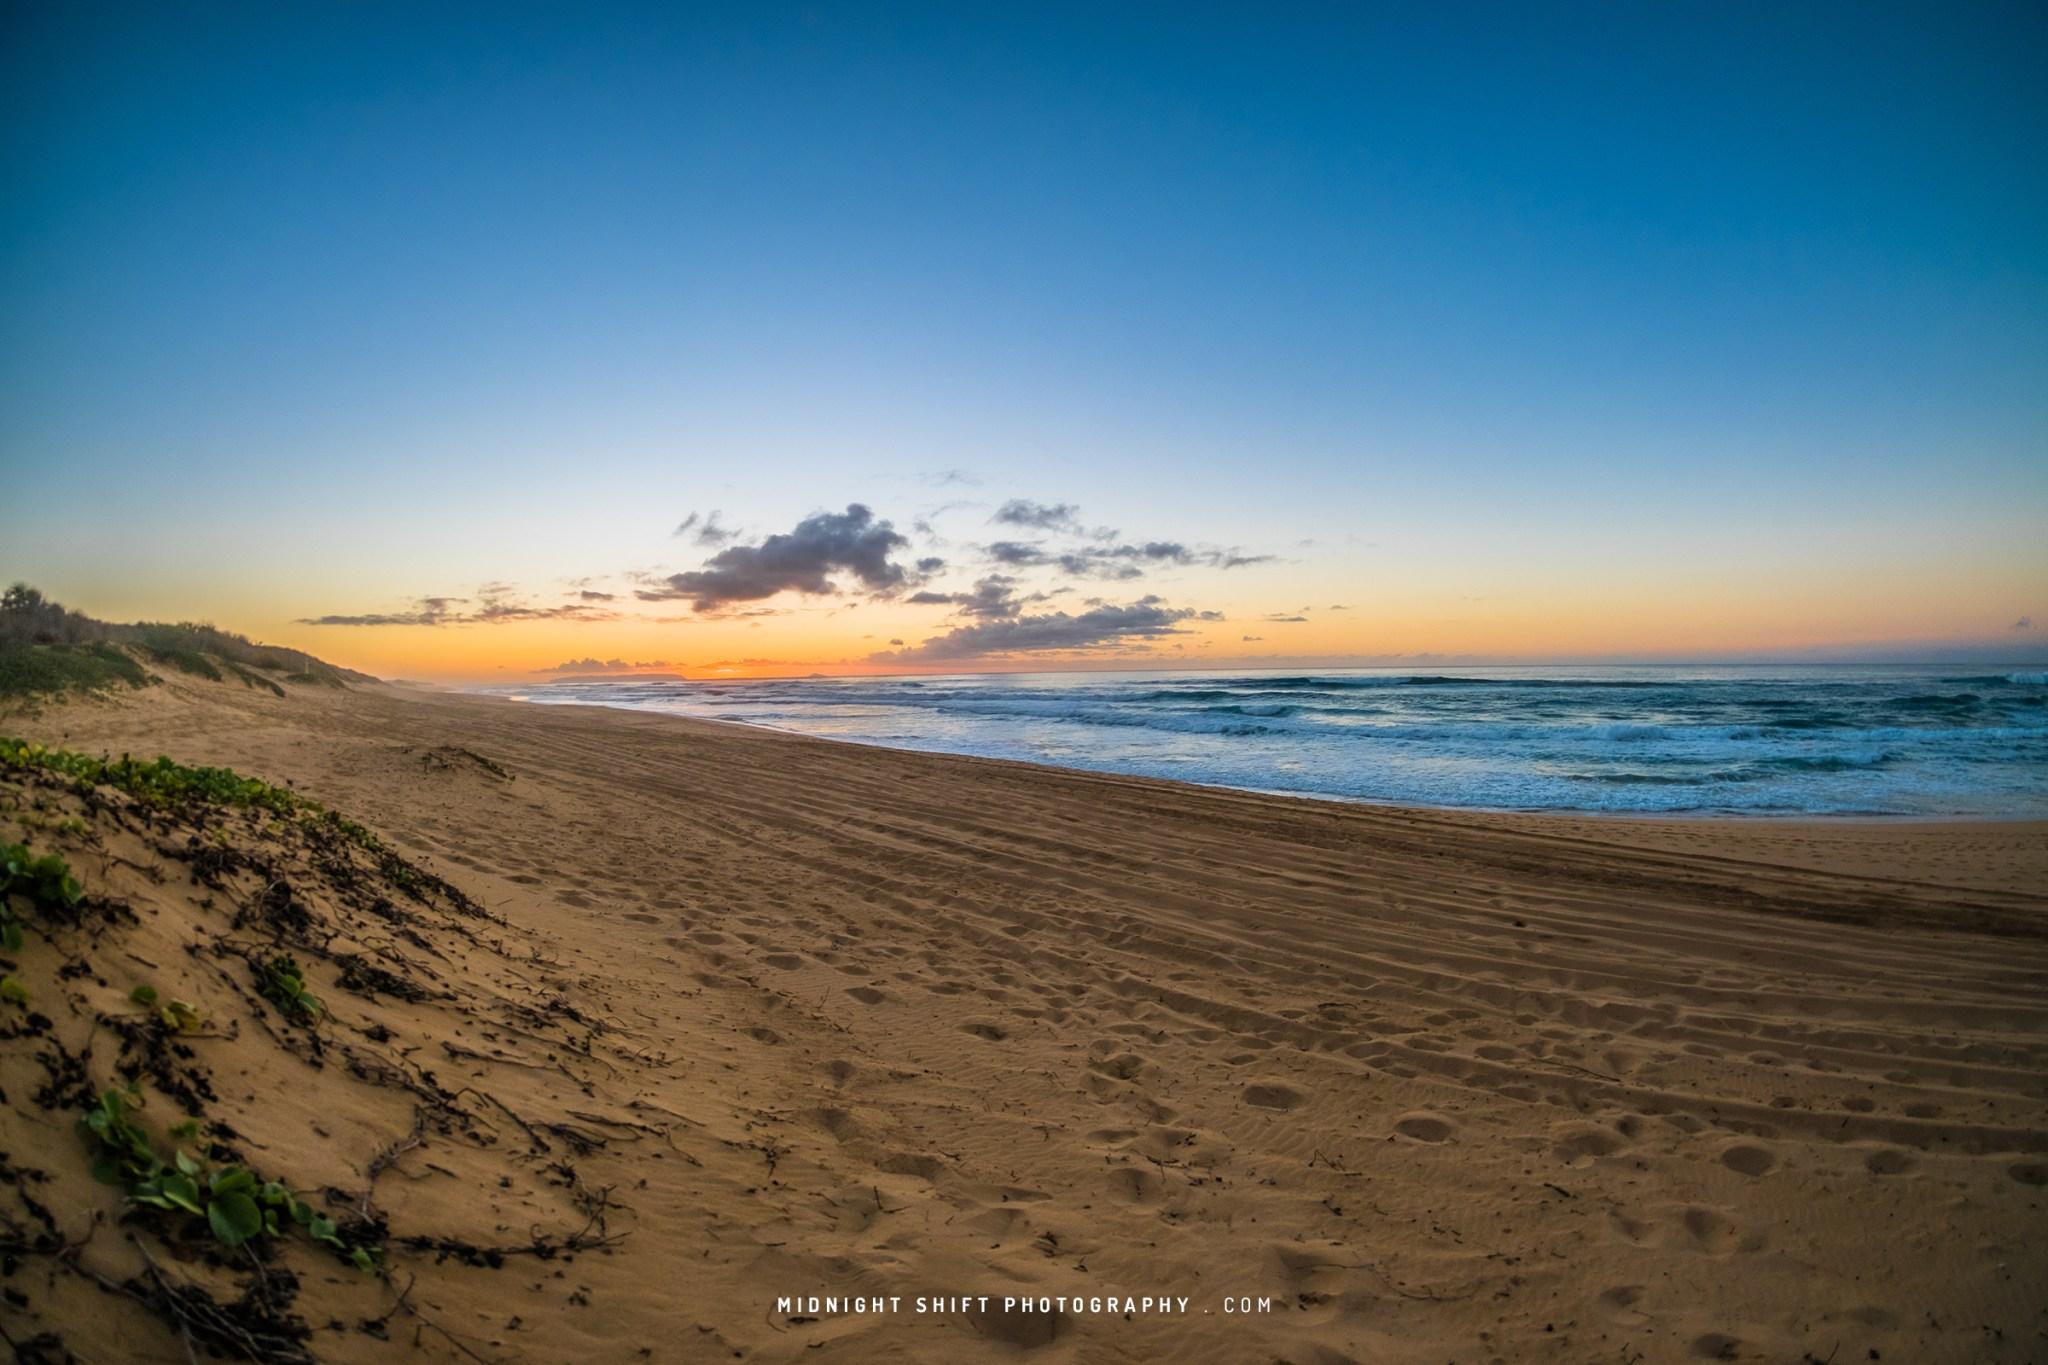 Sunset at Polihale Beach on the island of Kauai, Hawaii